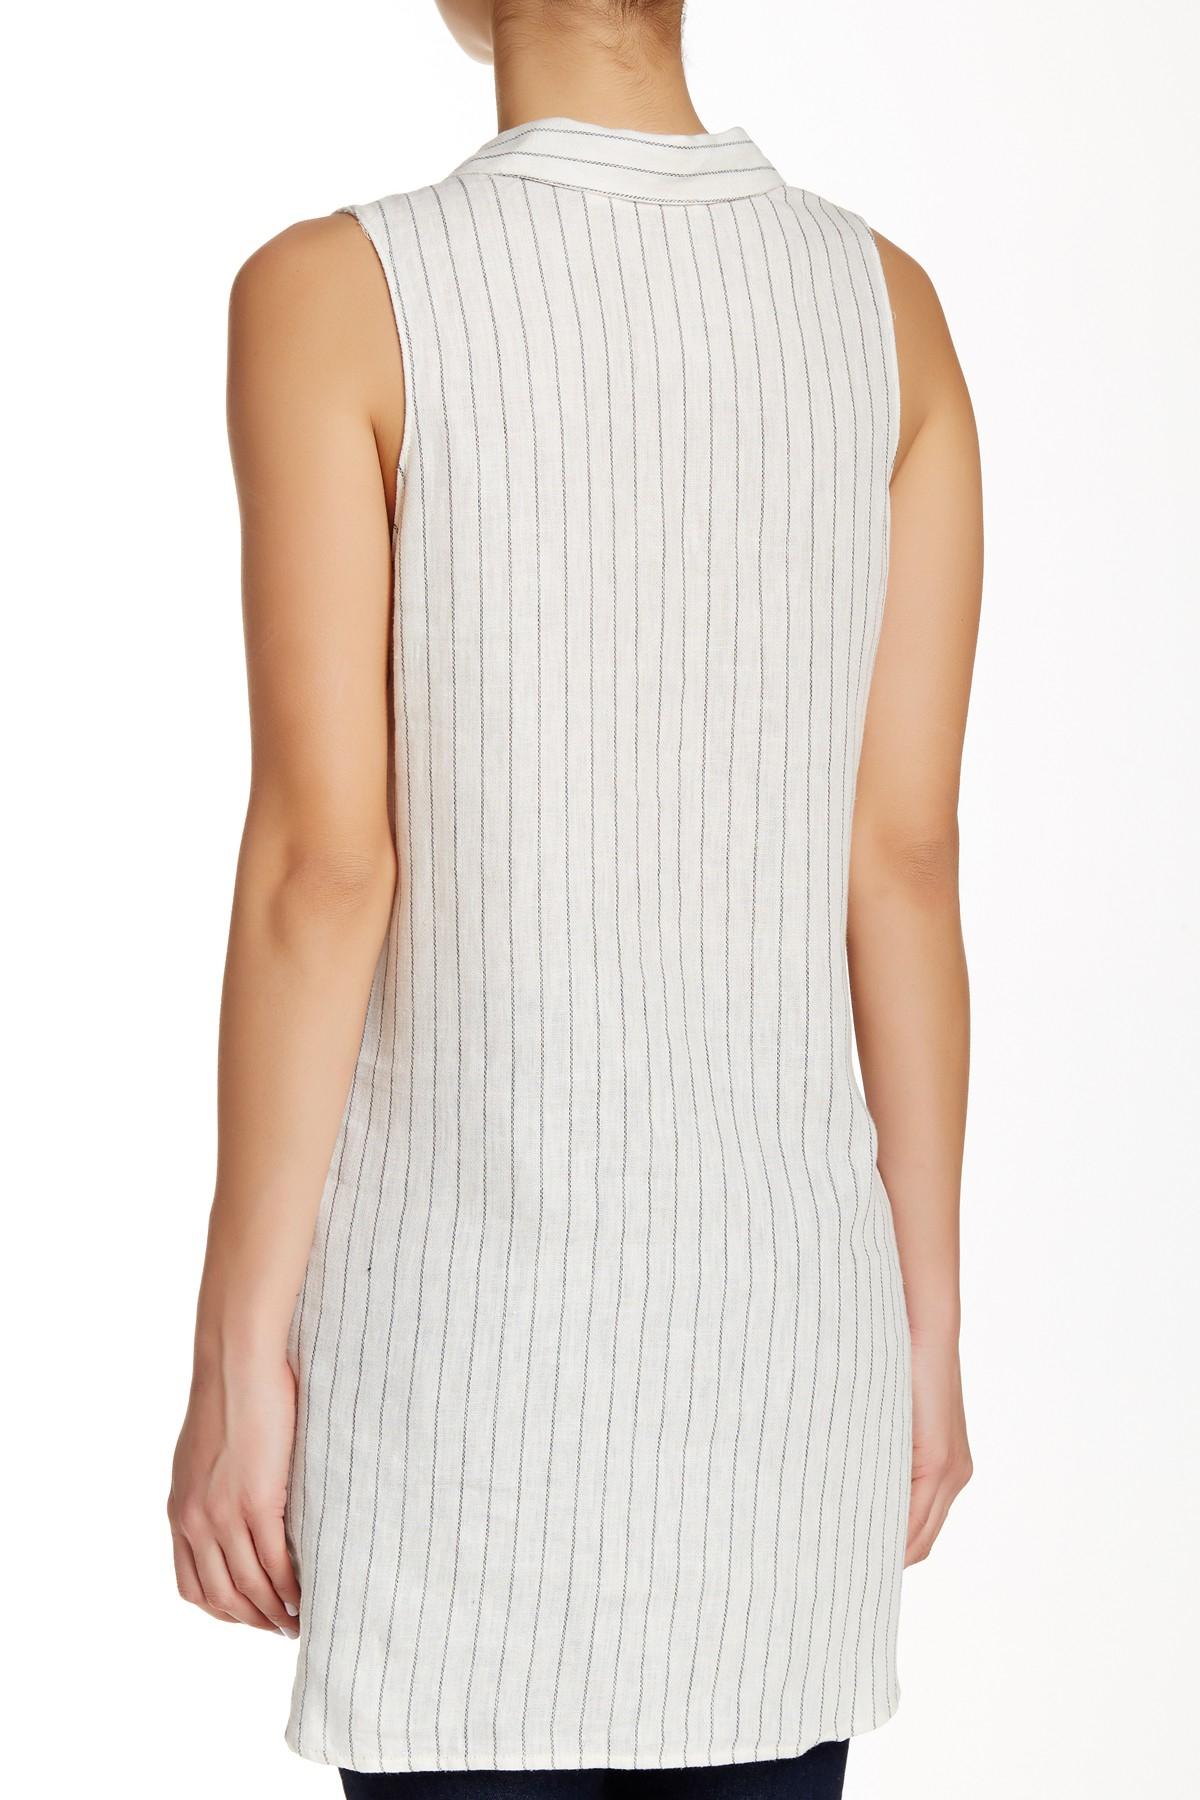 Lush Sleeveless Collared Shirt In White Lyst